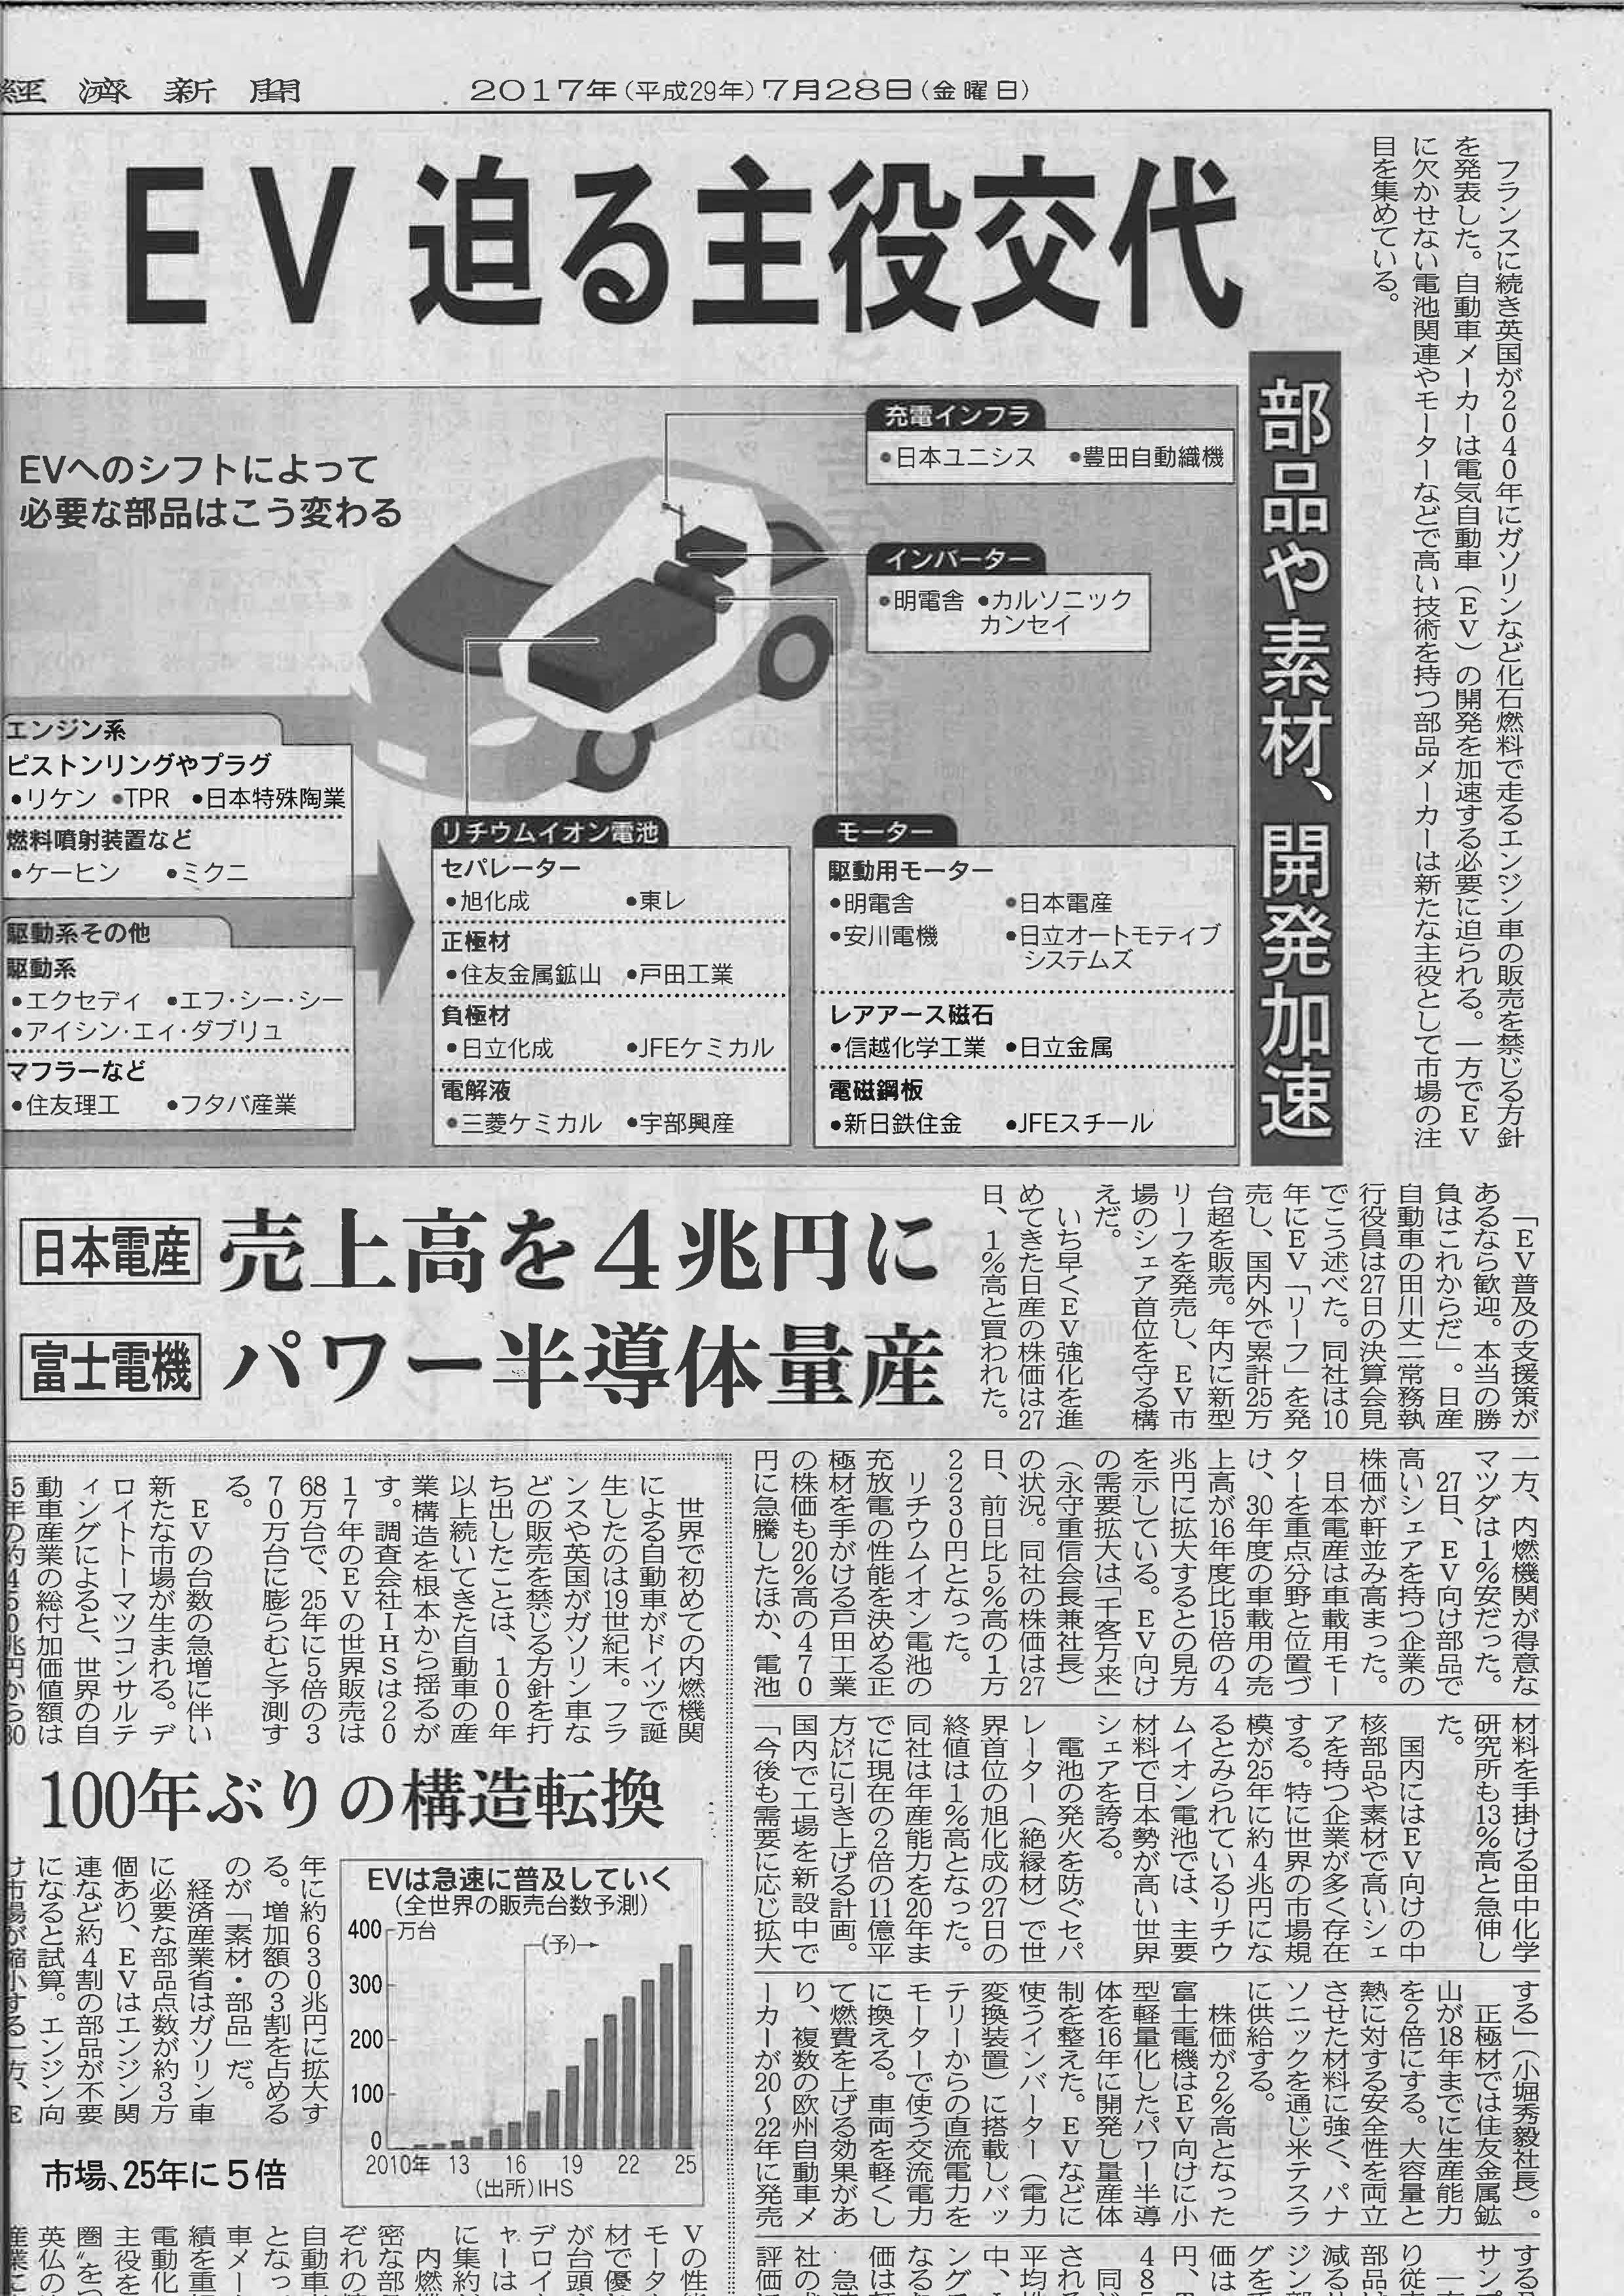 EV 素材・部品主役交代 日経